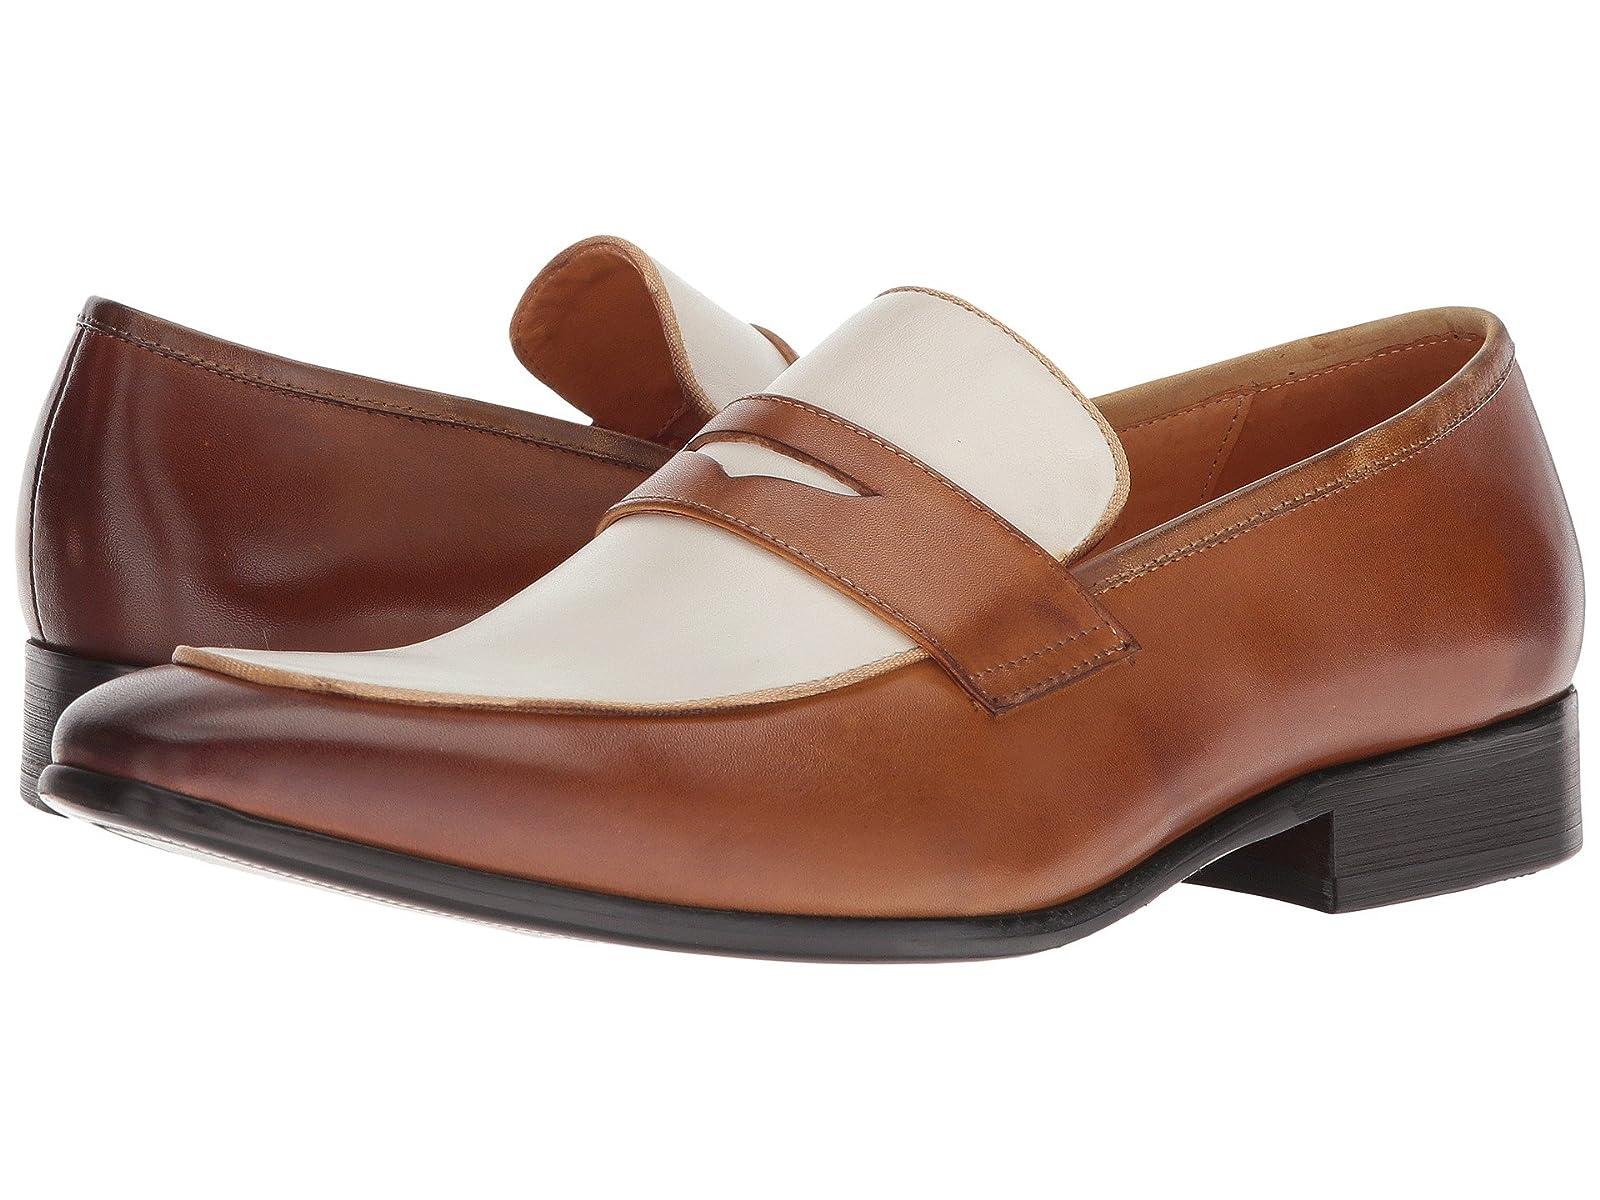 Carrucci KellyAtmospheric grades have affordable shoes